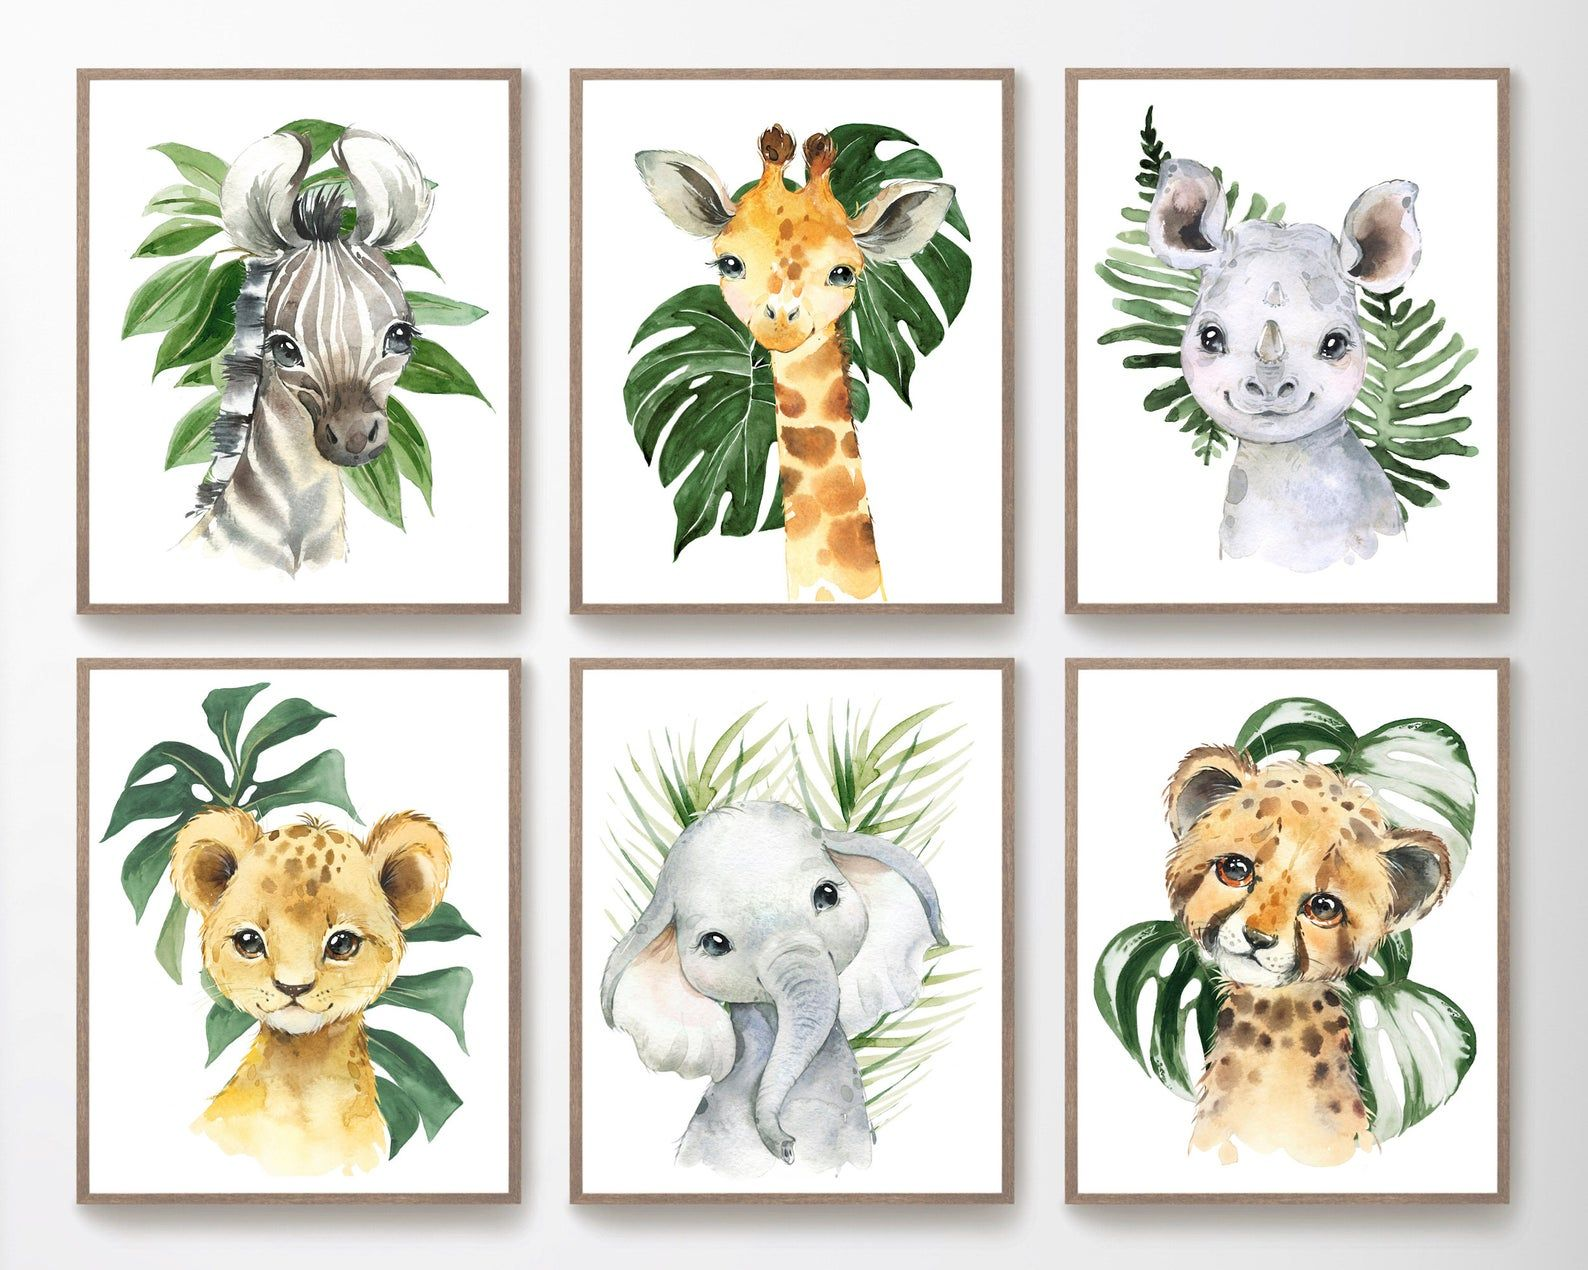 Safari Nursery Decor Watercolor Animal Prints Jungle Animals Baby Boy Nursery Wall Art Tropical Leaves Boys Room Decor Kids Playroom Safari Nursery Prints Safari Nursery Decor Safari Nursery Painting